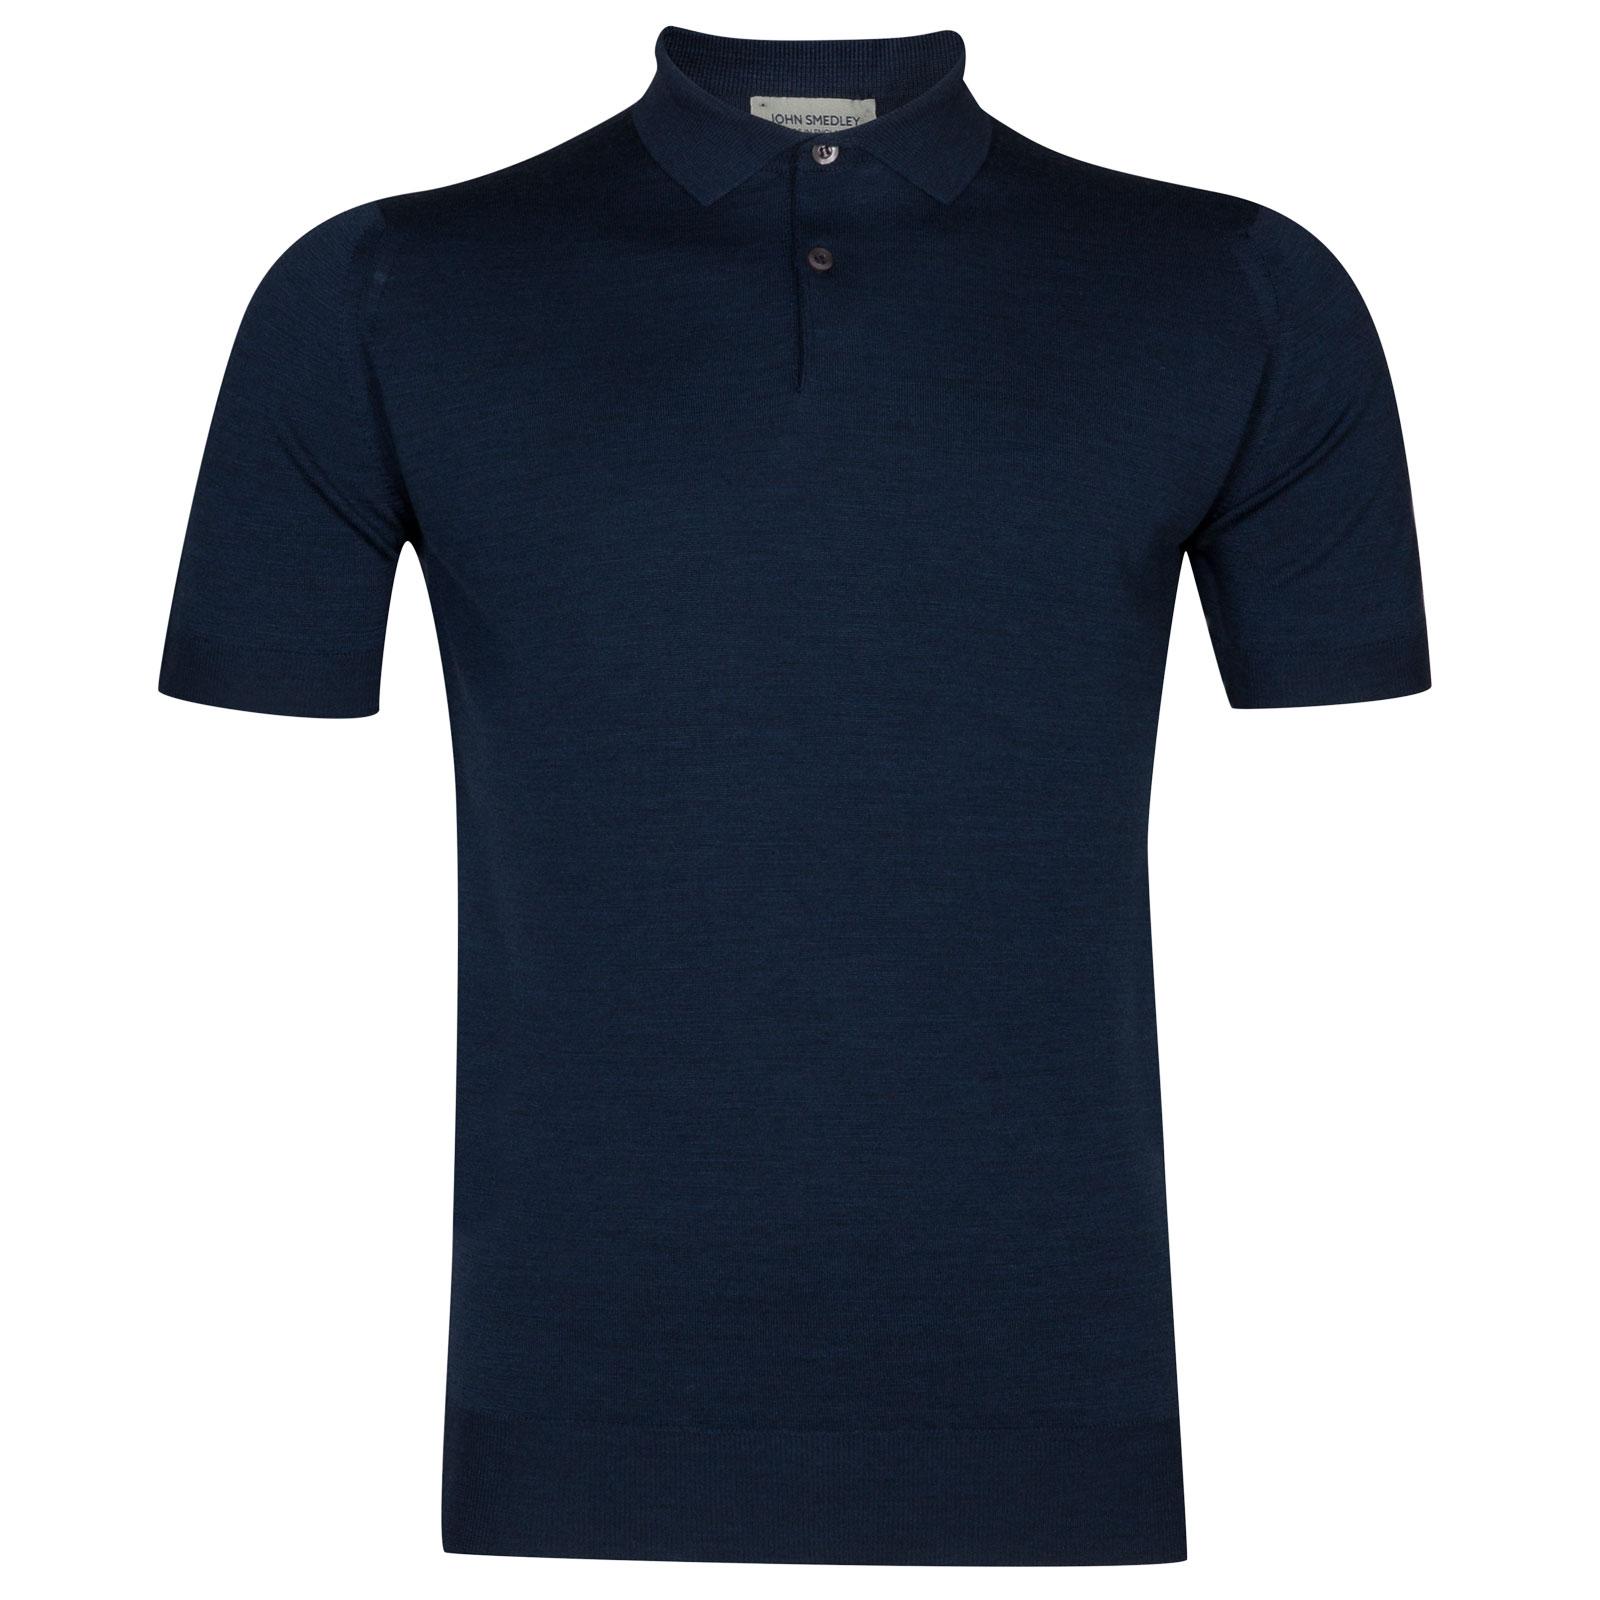 John Smedley payton Merino Wool Shirt in Indigo-XXL